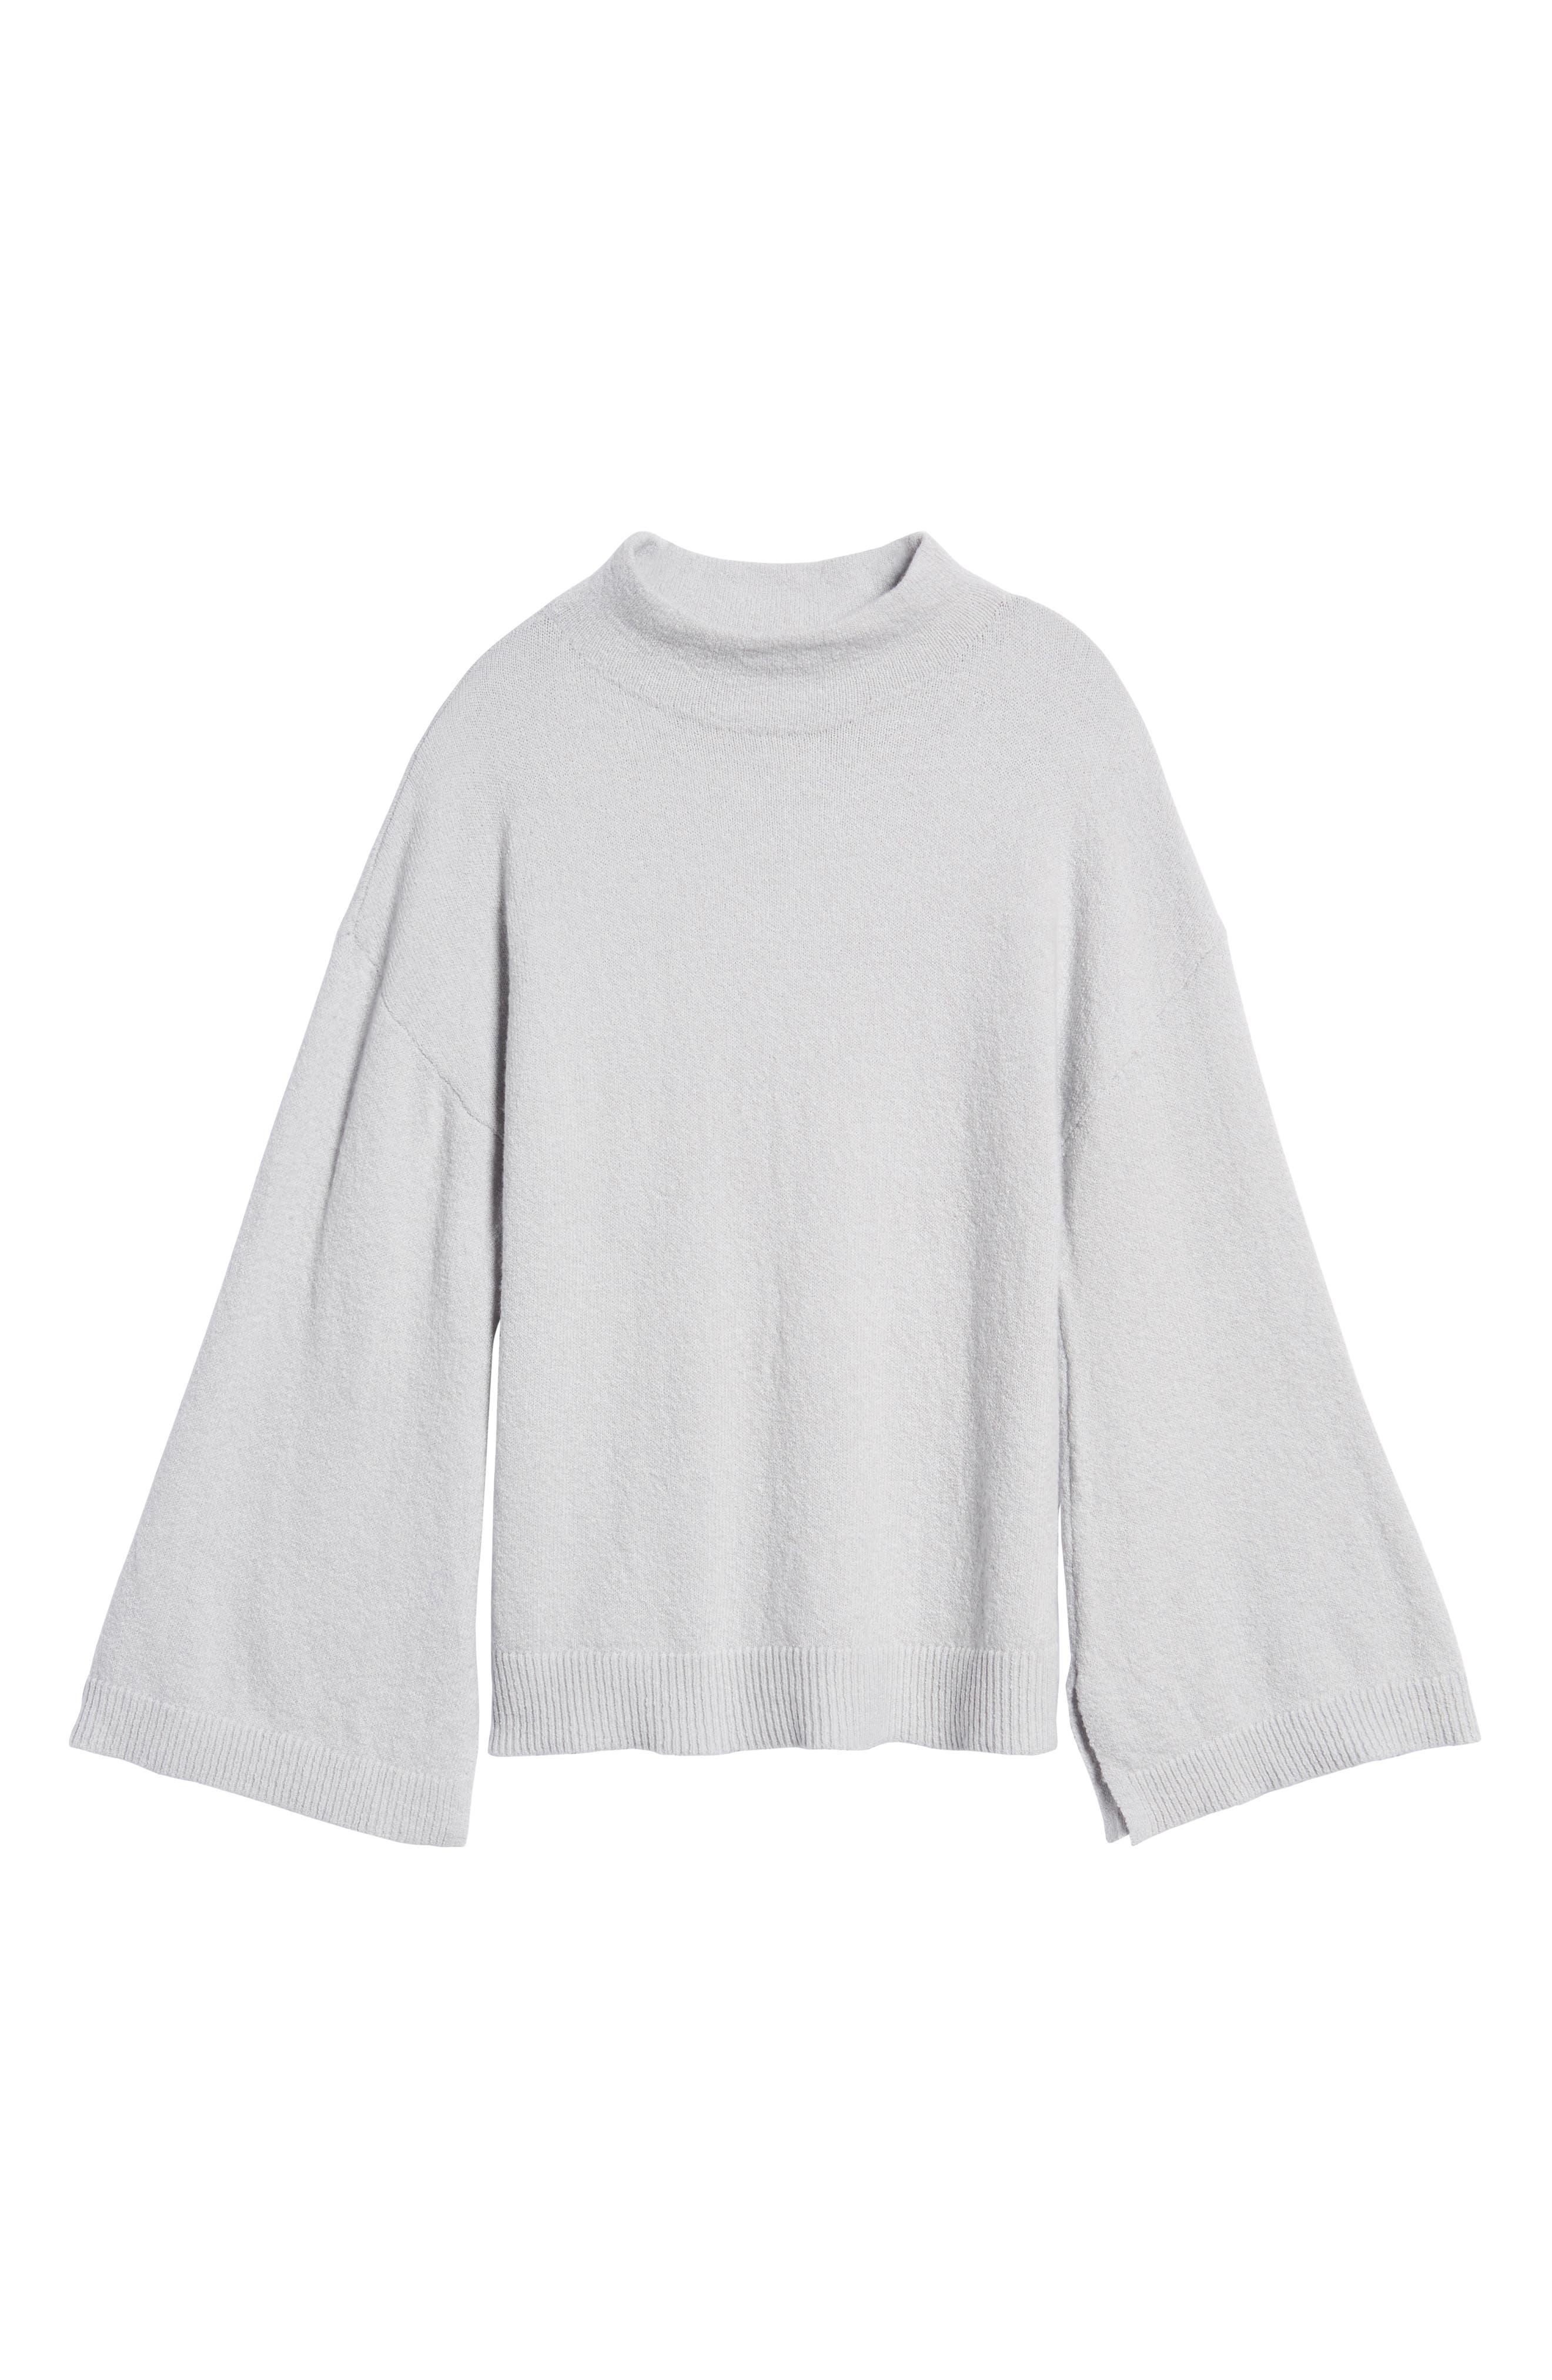 Dolman Sleeve Sweater,                             Alternate thumbnail 23, color,